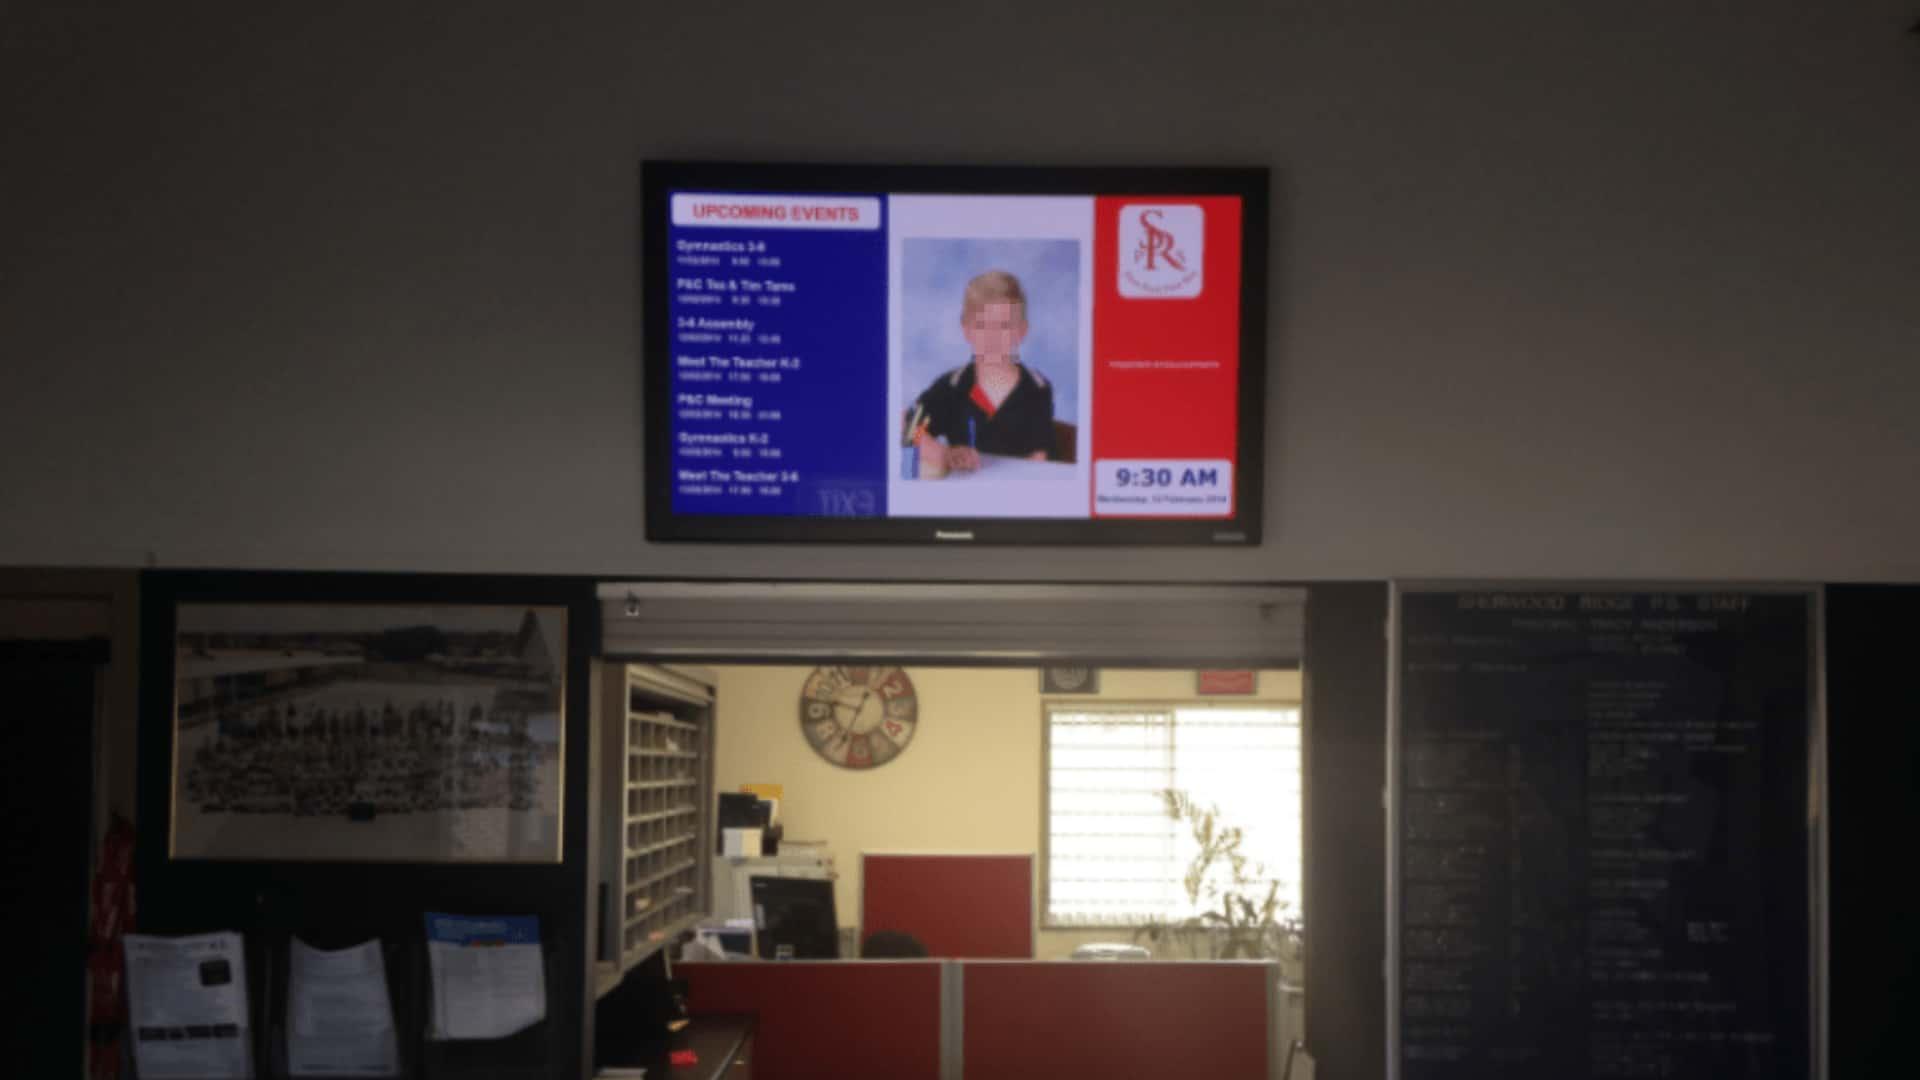 Advertise Me Digital Signage Sherwood Ridge Public School Education Board Sentral Integration Reception